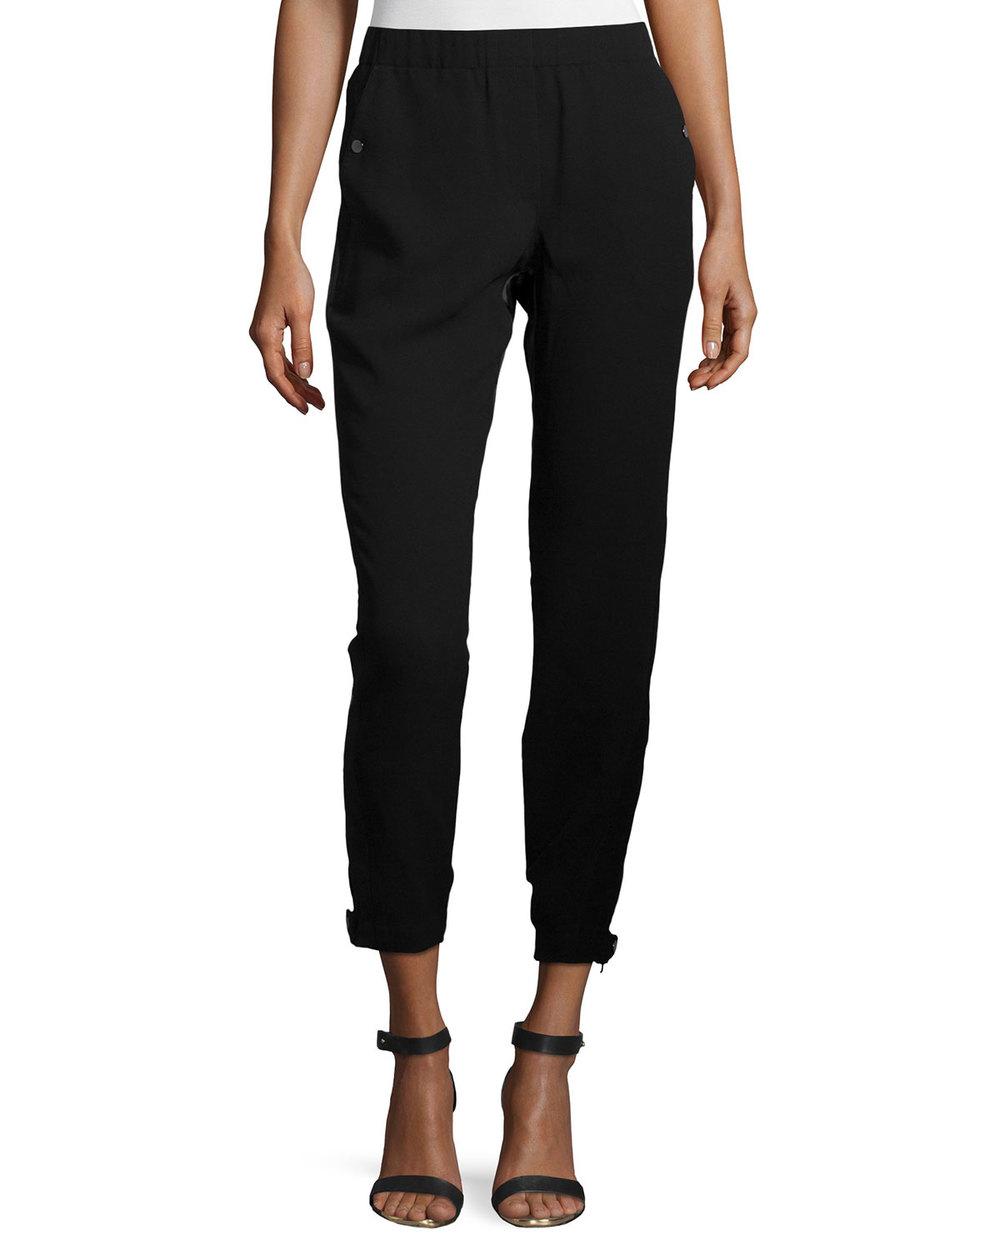 Halston Heritage Mid-Rise Combo Jogger Pants, Black • $70.40 • Neiman Marcus